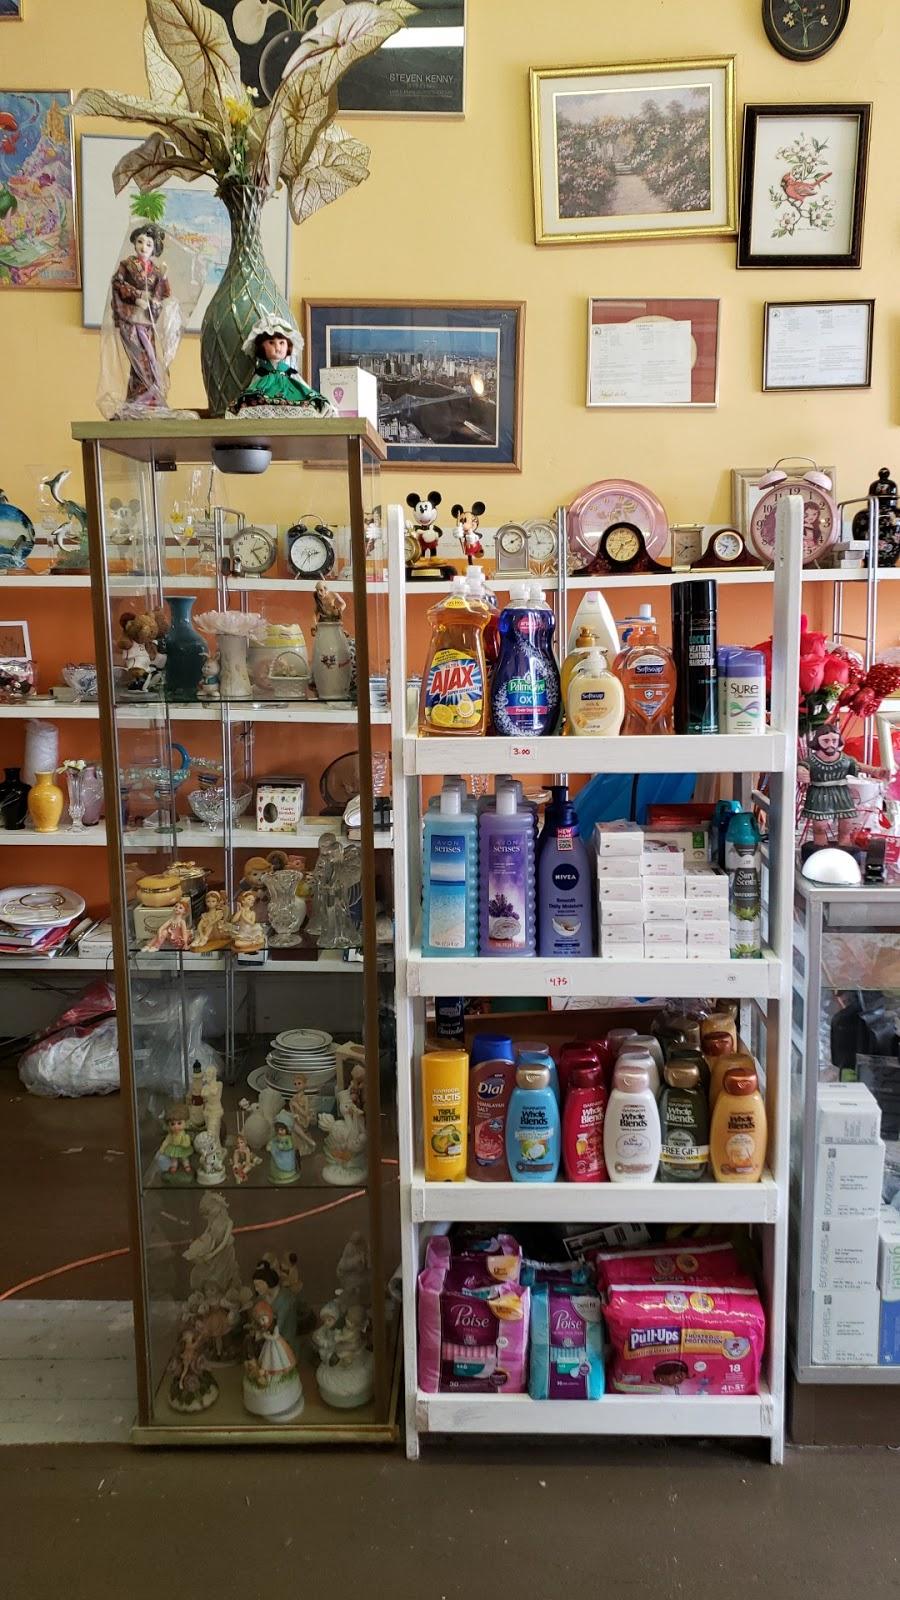 Brisas Treasures - home goods store  | Photo 7 of 10 | Address: 45 Belmont Ave, Garfield, NJ 07026, USA | Phone: (973) 563-2723